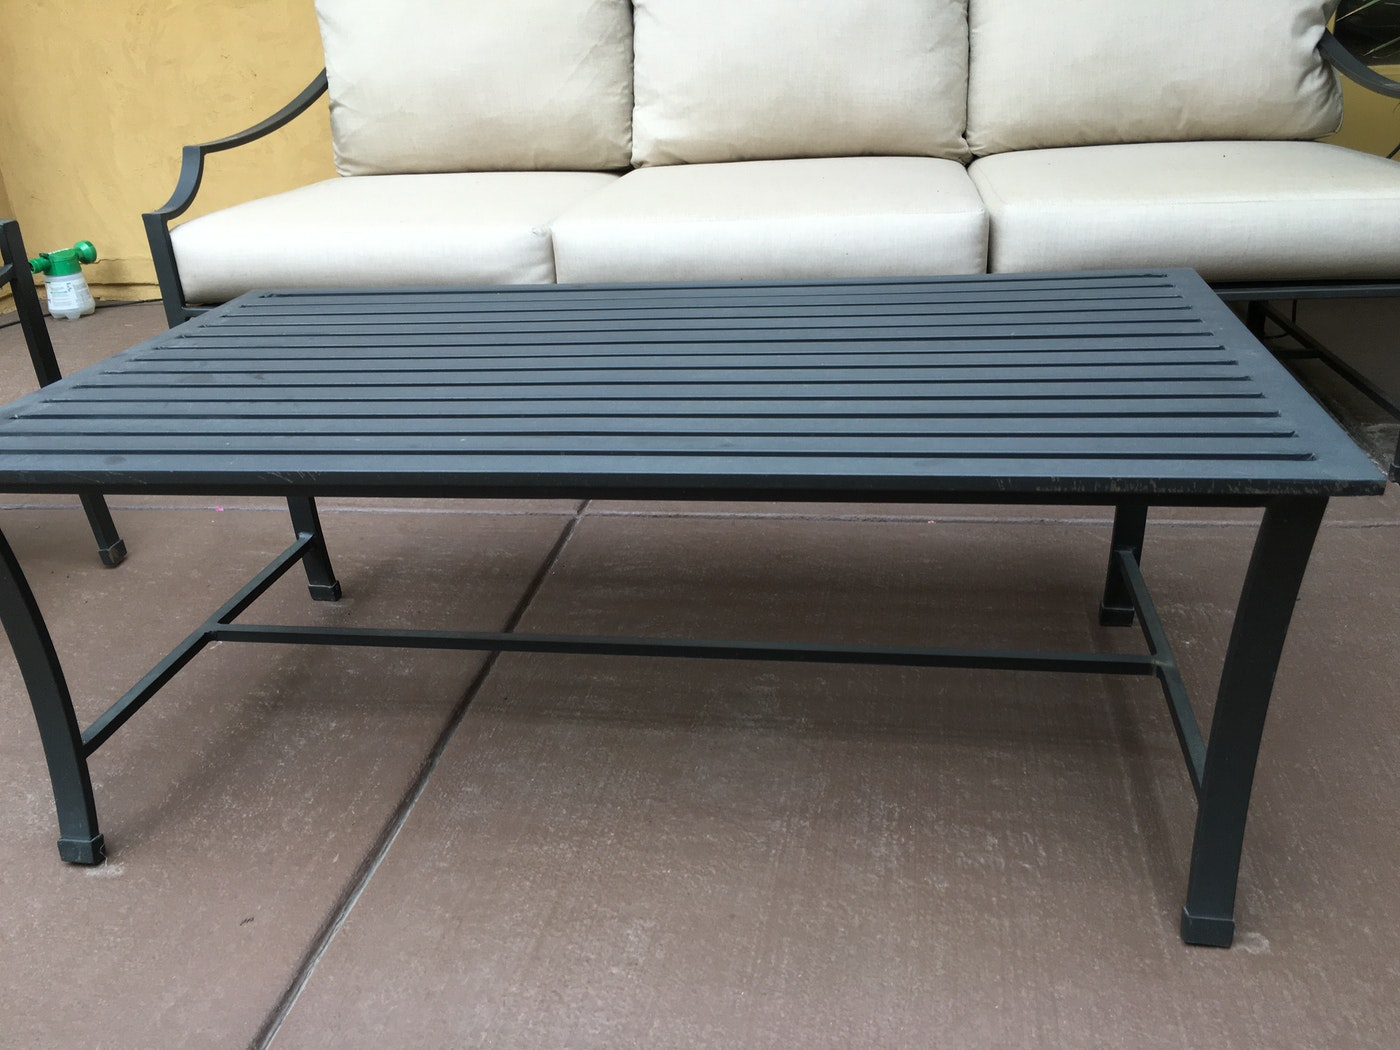 Set of restoration hardware carmel collection patio furniture ebth - Restoration hardware patio ...